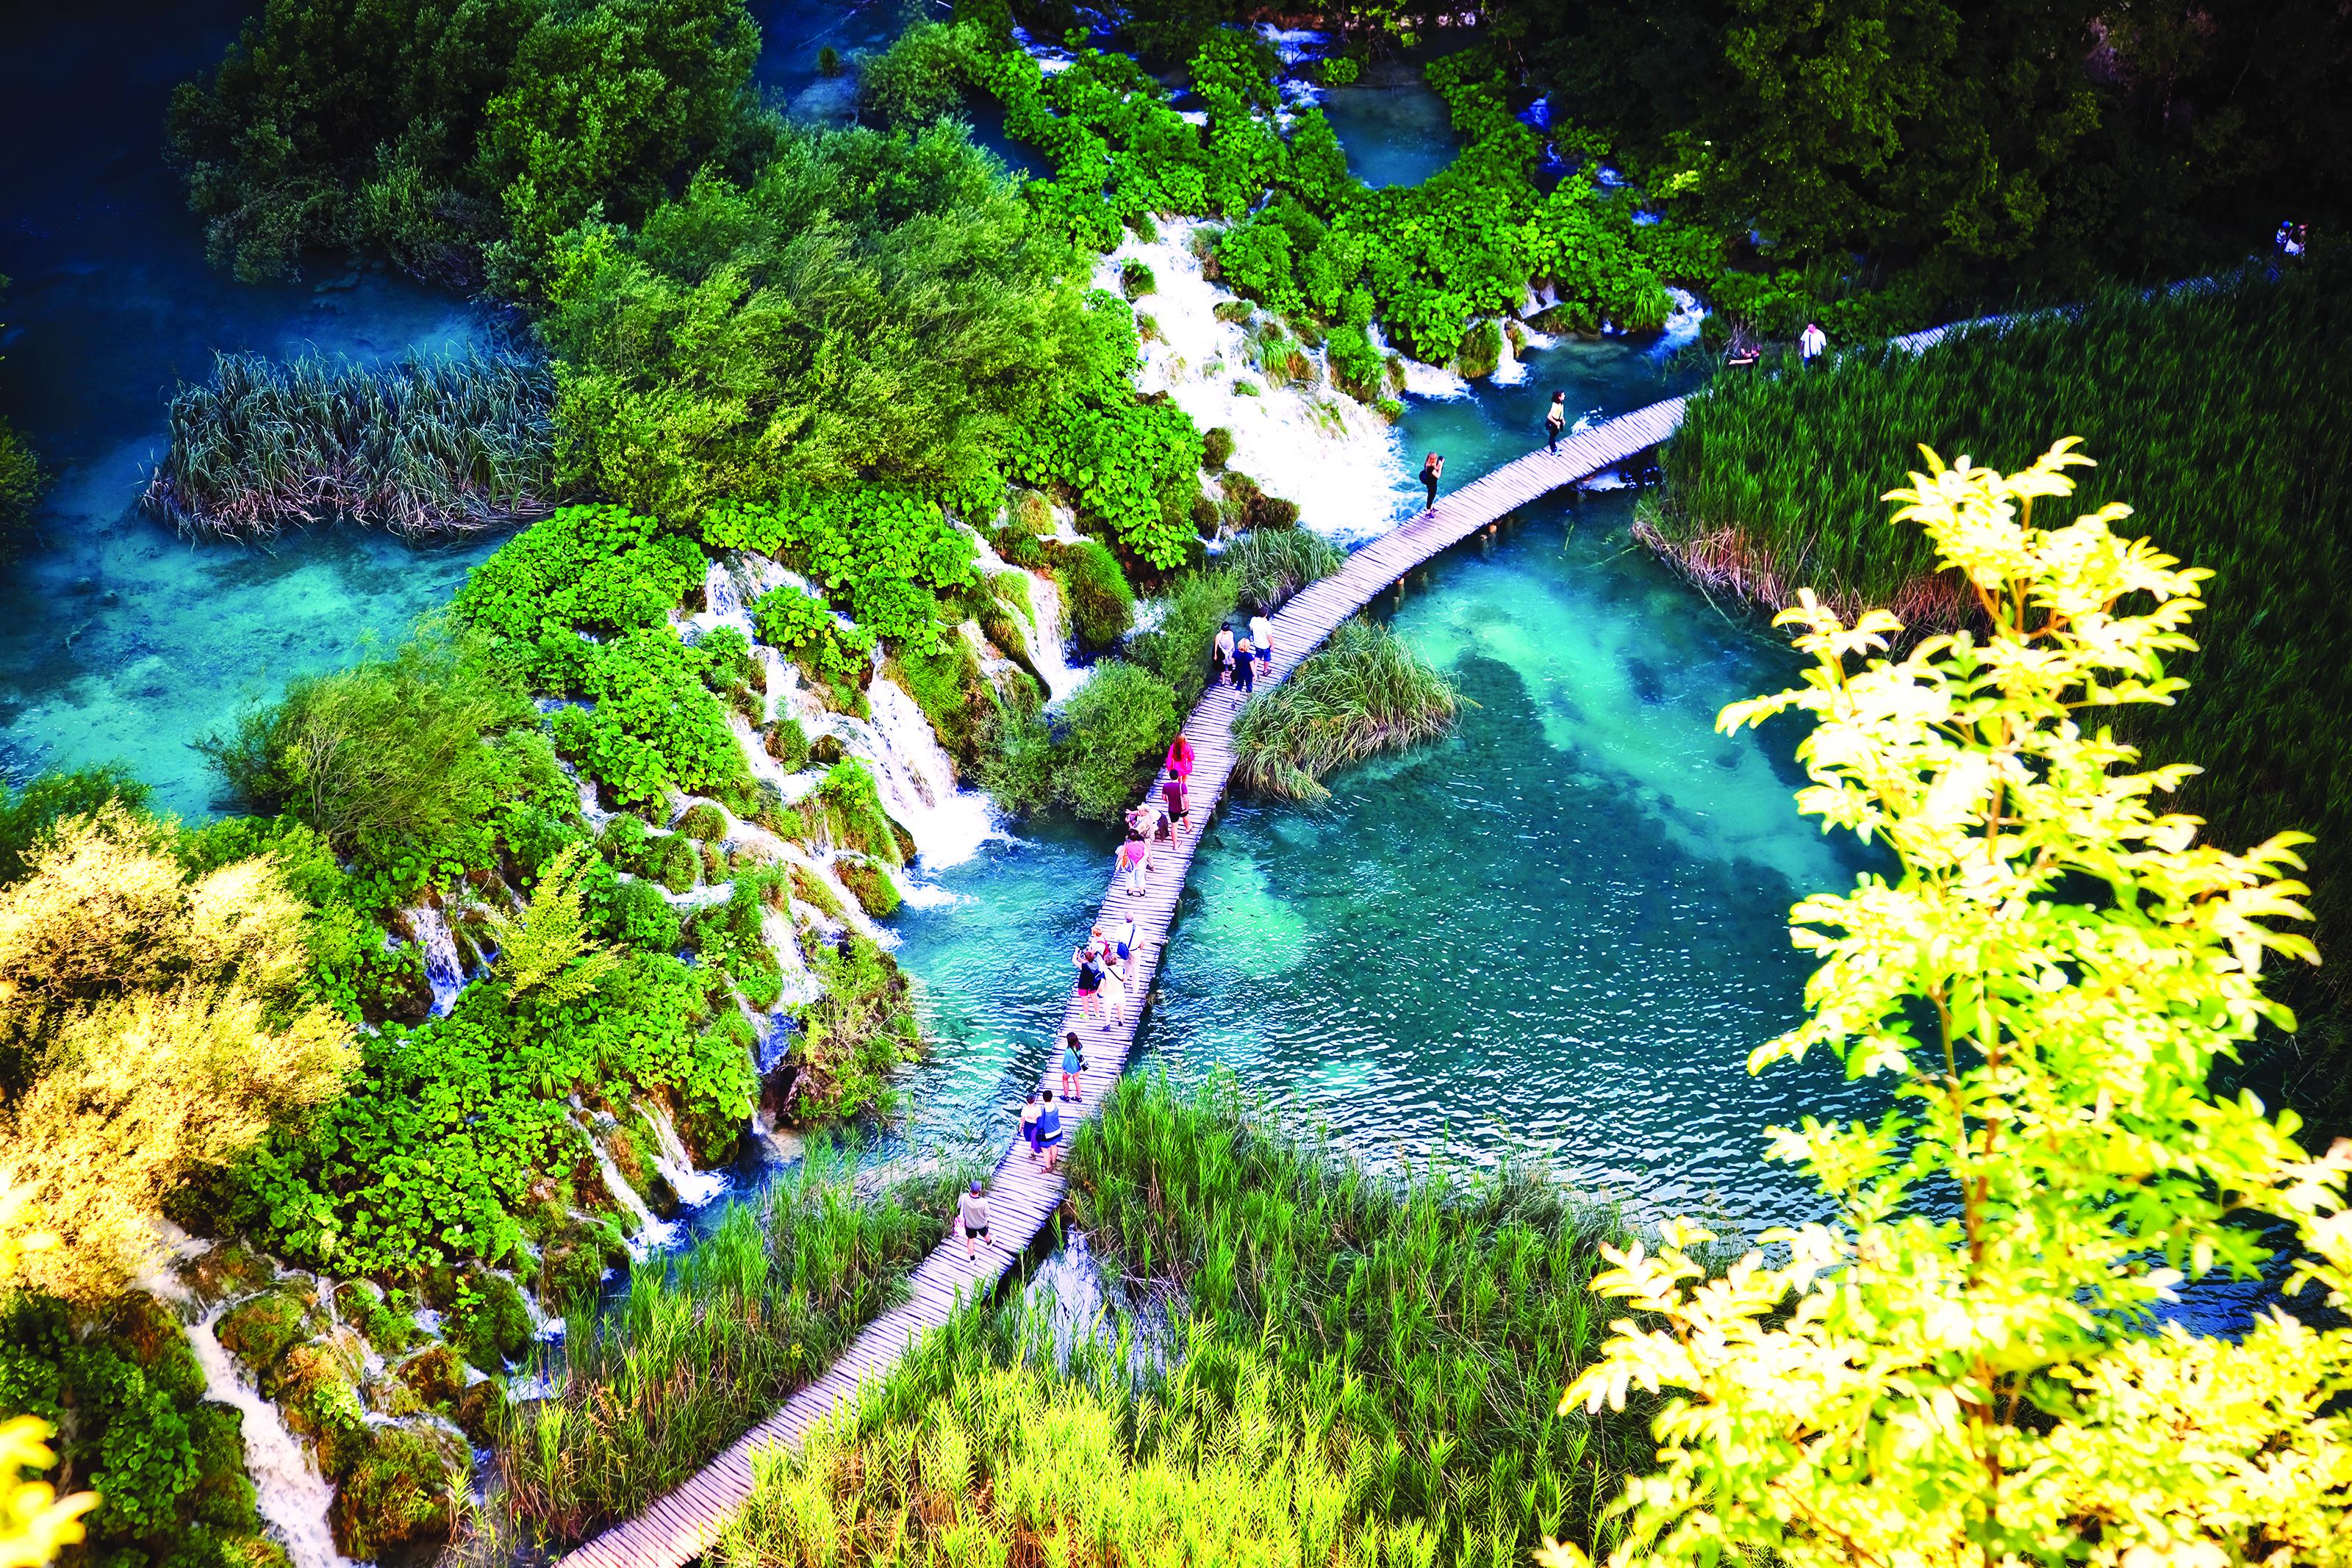 Let's go! Στο Εθνικό Πάρκο Λιµνών του Πλίτβιτσε στην Κροατία